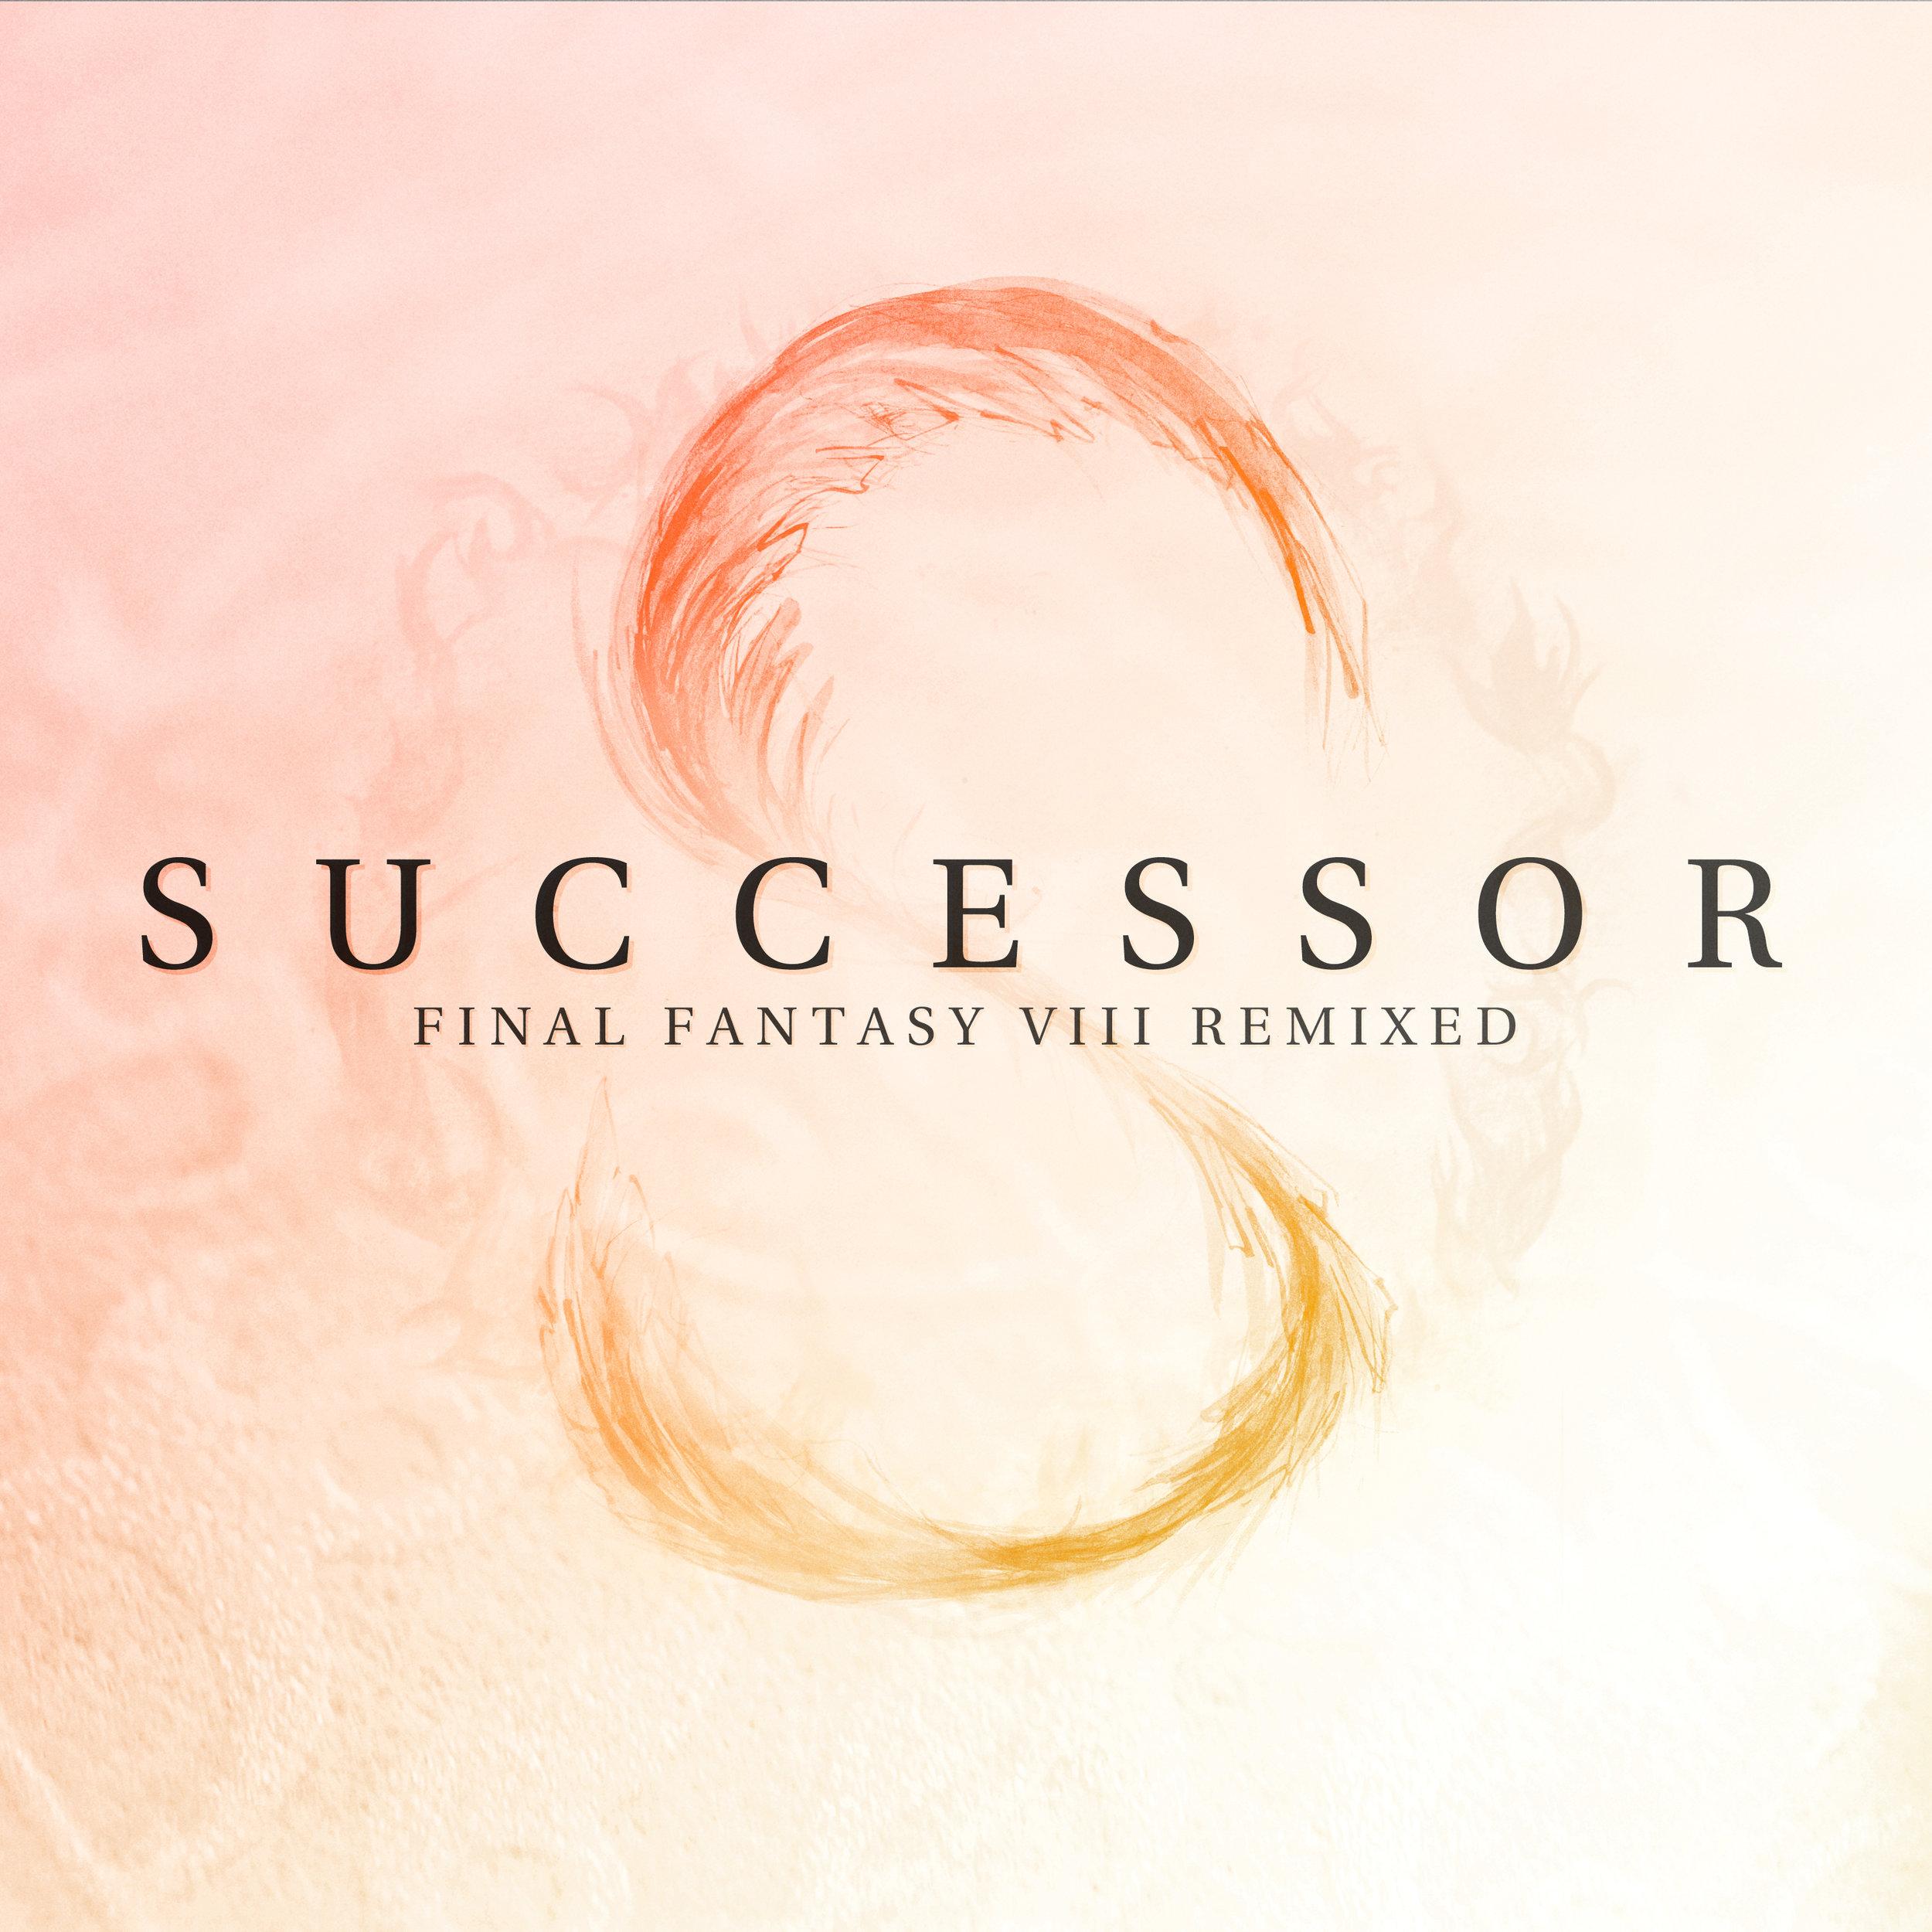 successor_final_fantasy_viii_remixed-album-cover.jpg